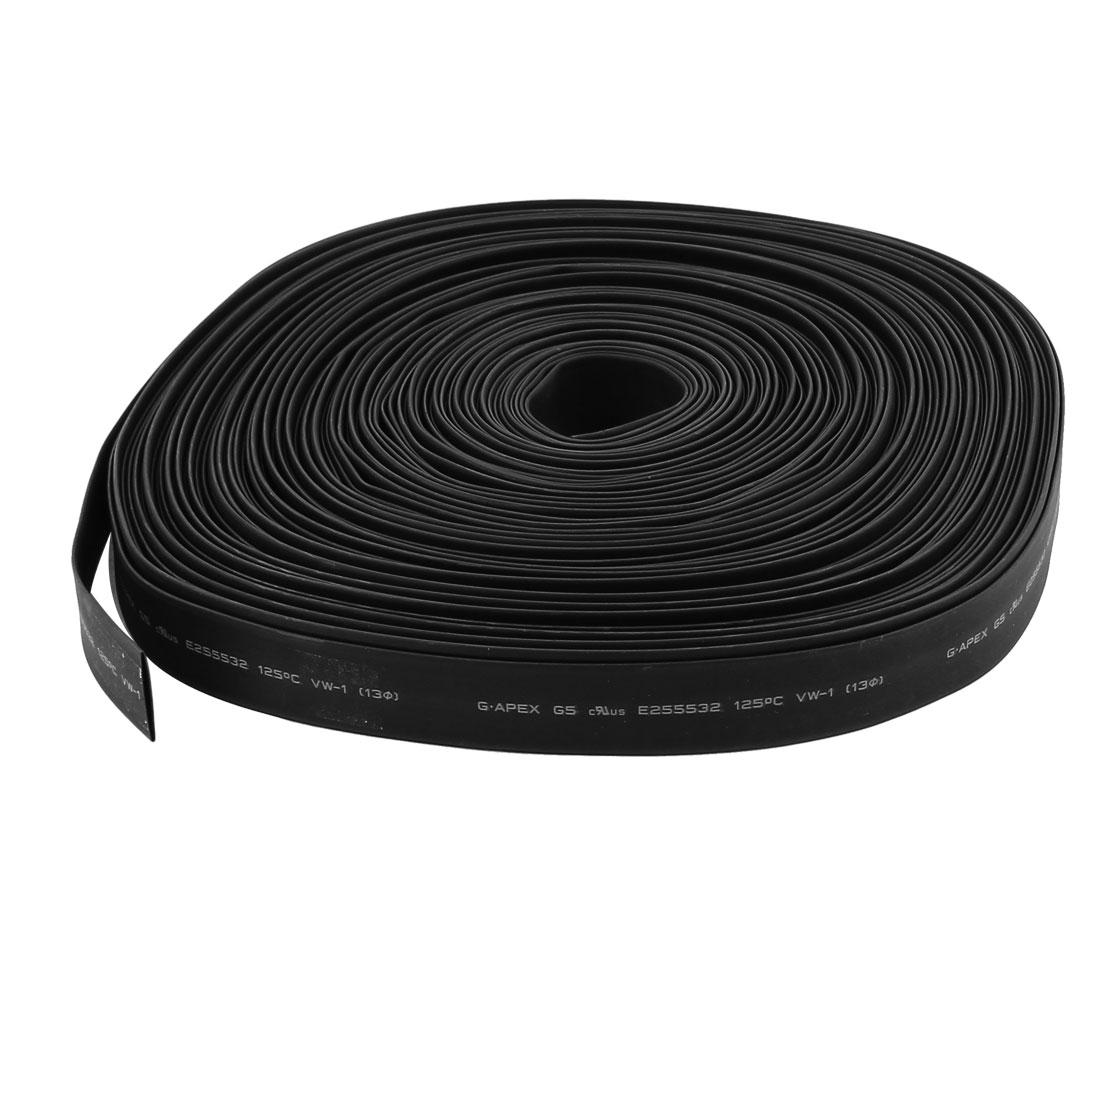 30m 13mm Dia Insulated PE Heat Shrink Tube 2:1 Shrinkage Ratio Waterproof Black